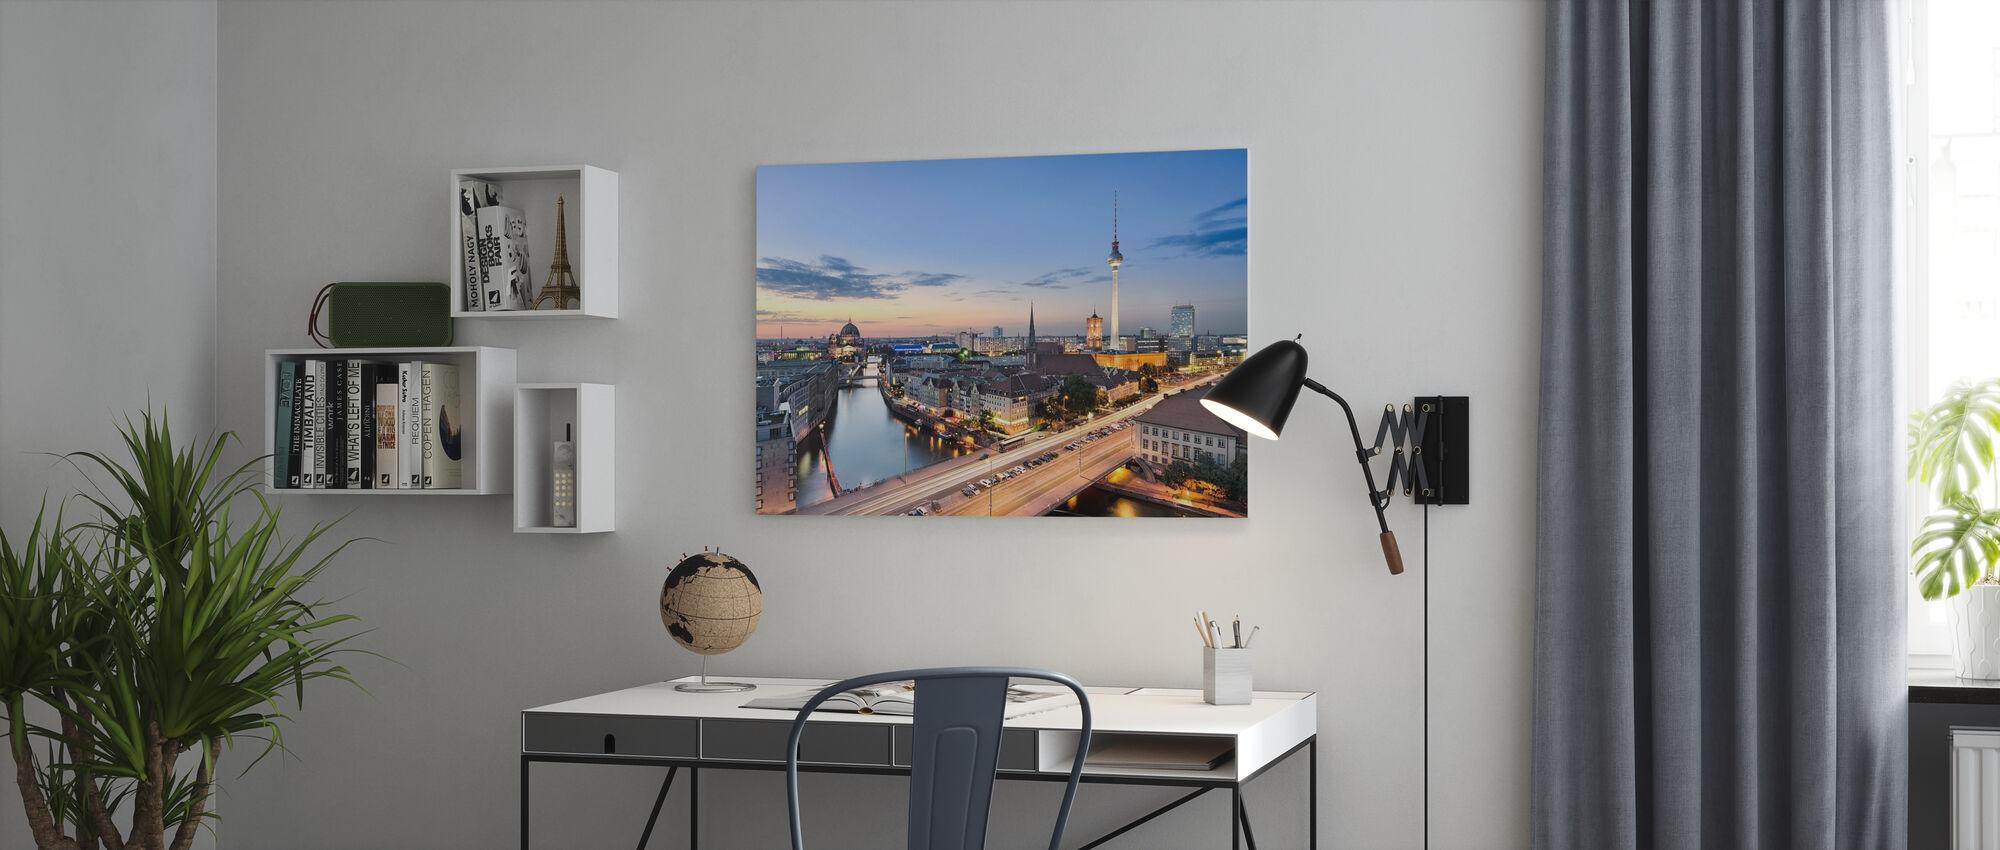 Berlin Skyline Panorama - Canvas print - Office